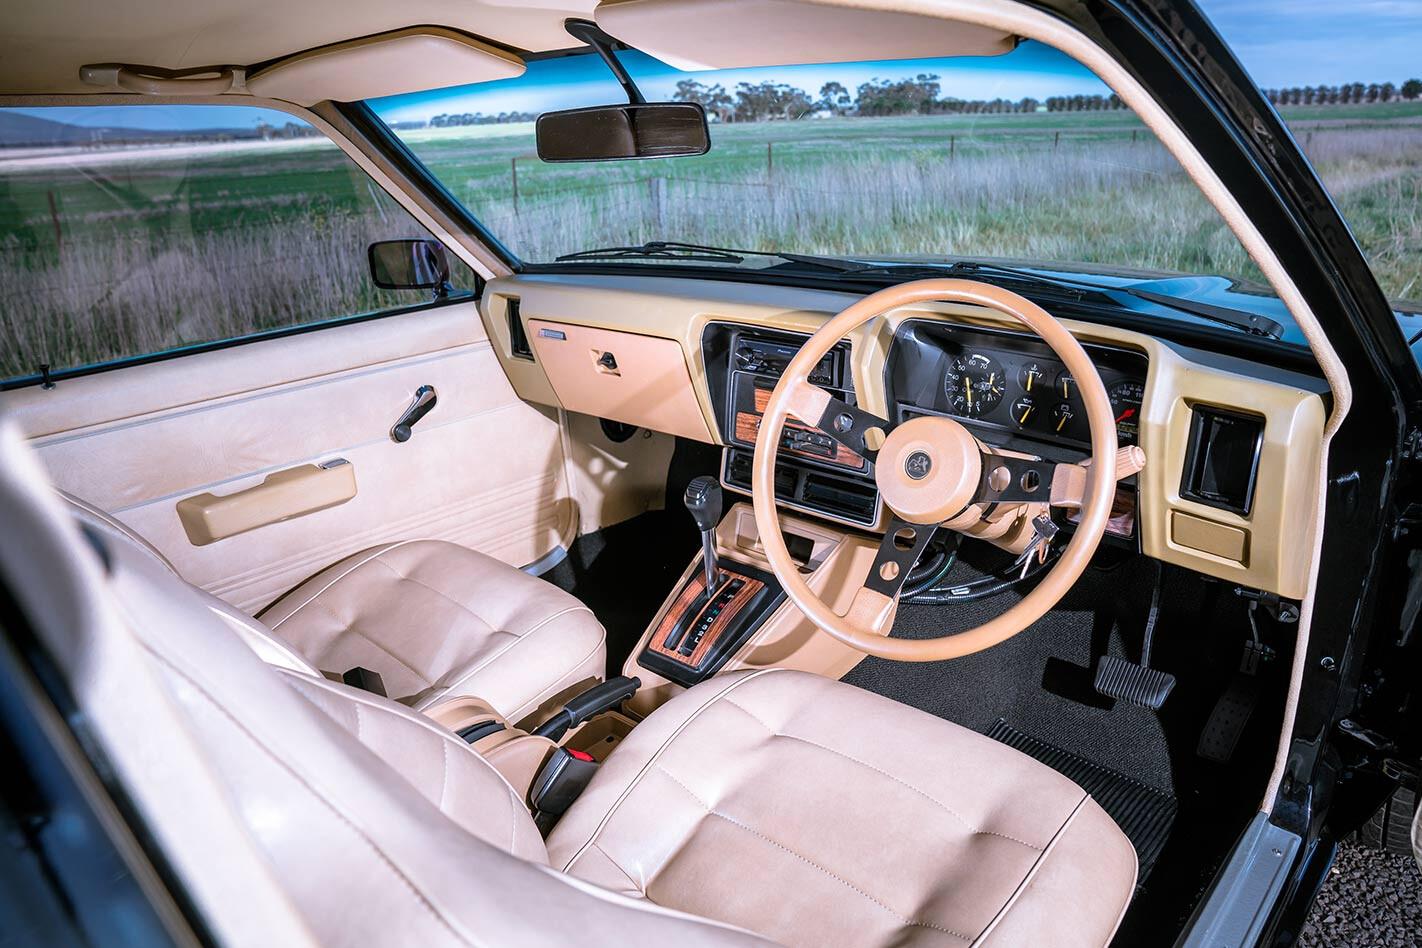 Holden UC Torana interior